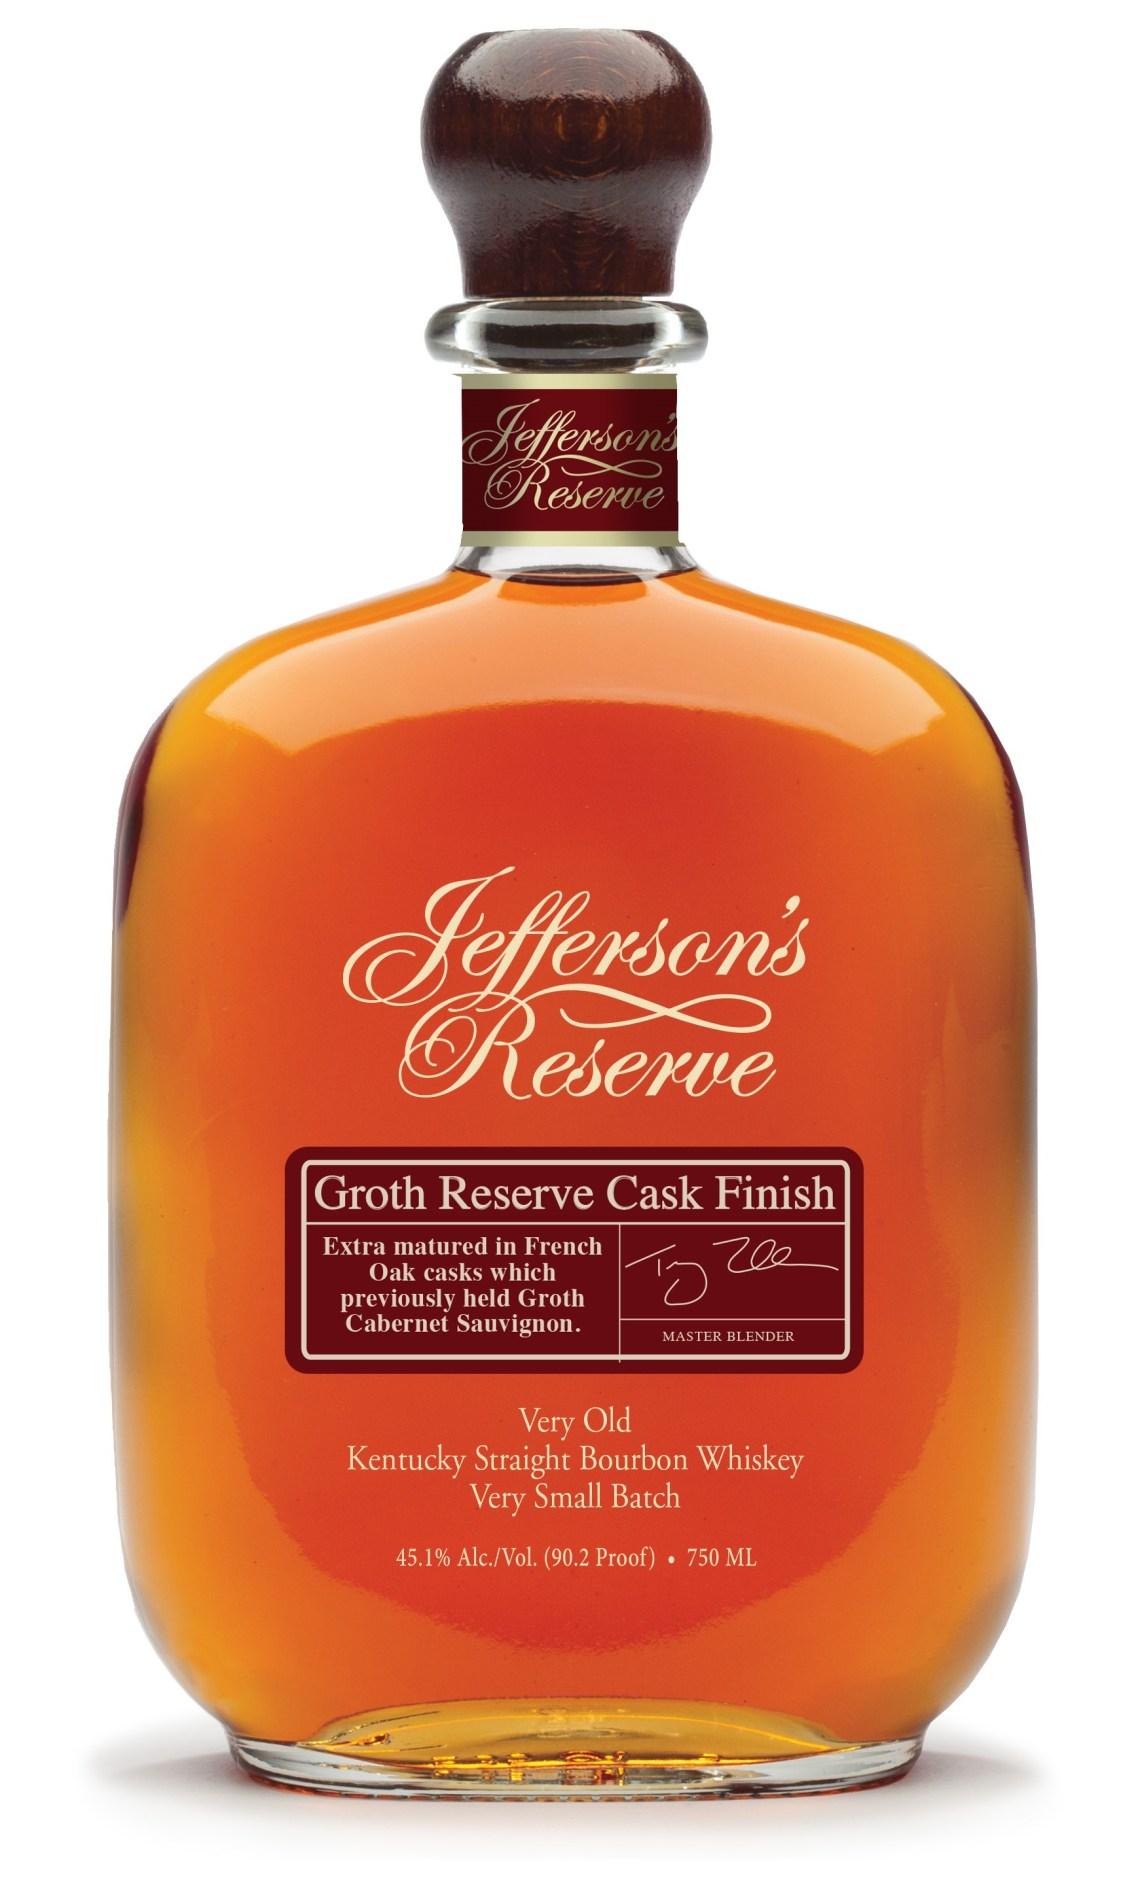 Jefferson's Reserve Groth Reserve Cask Finish Bourbon